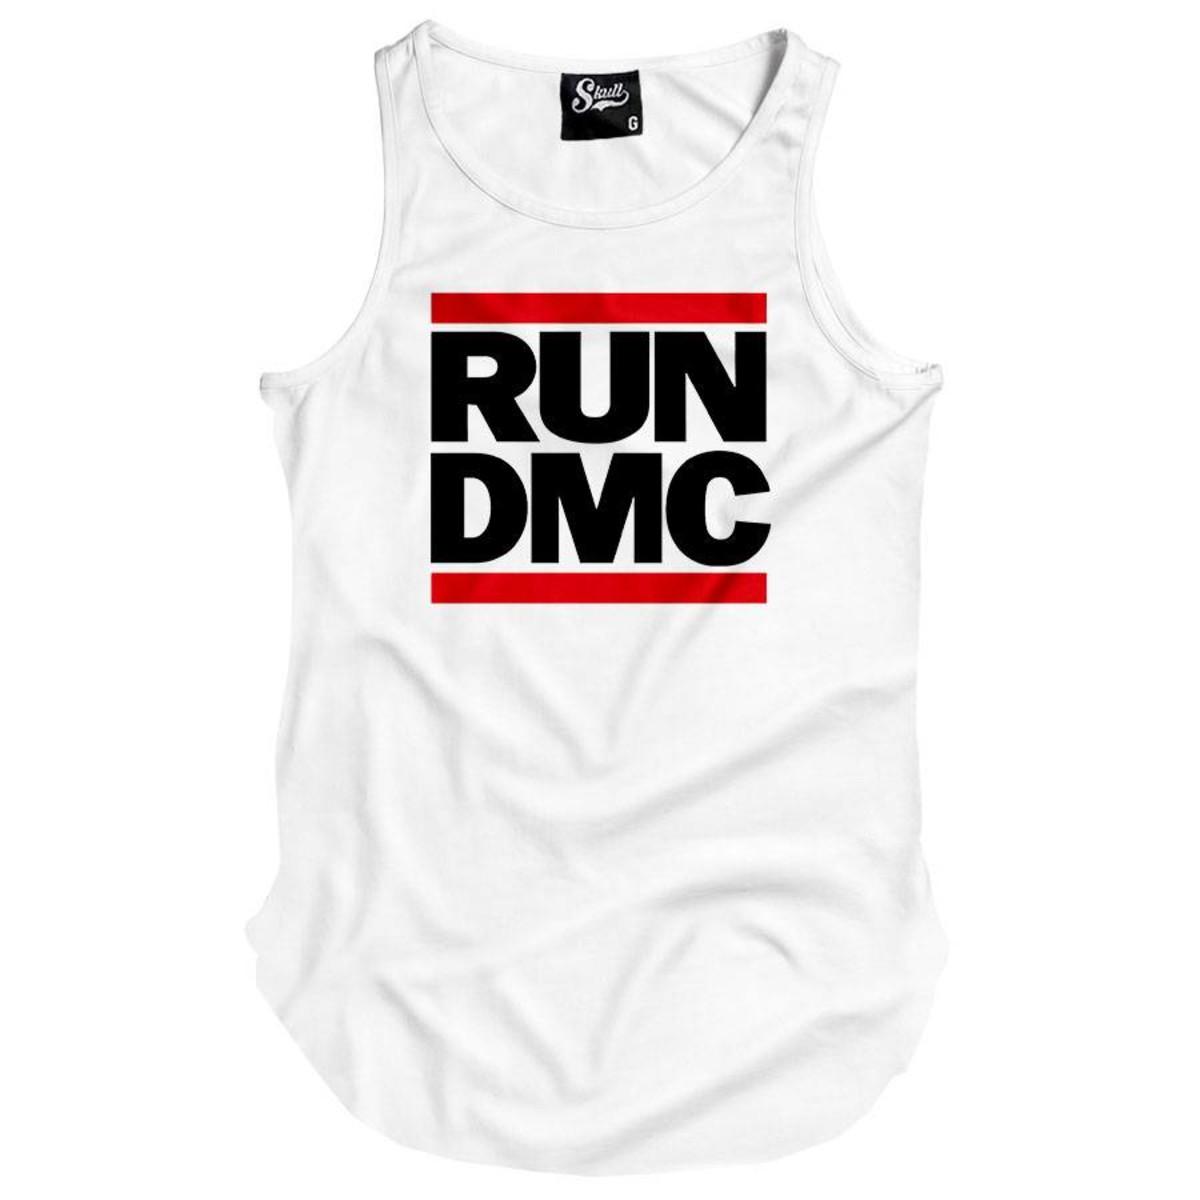 aeee186b5 Camiseta Regata Masculinas Longline Run Dmc Swag rap no Elo7